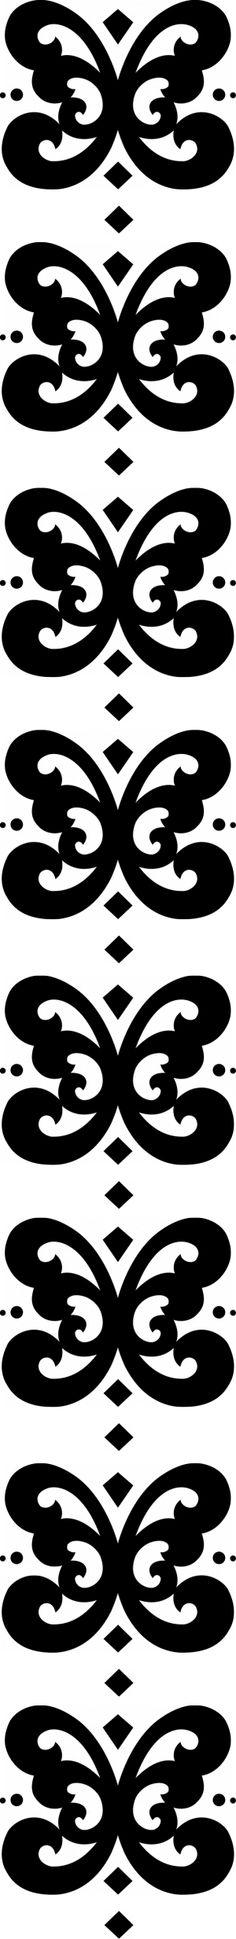 stencil border *vector*